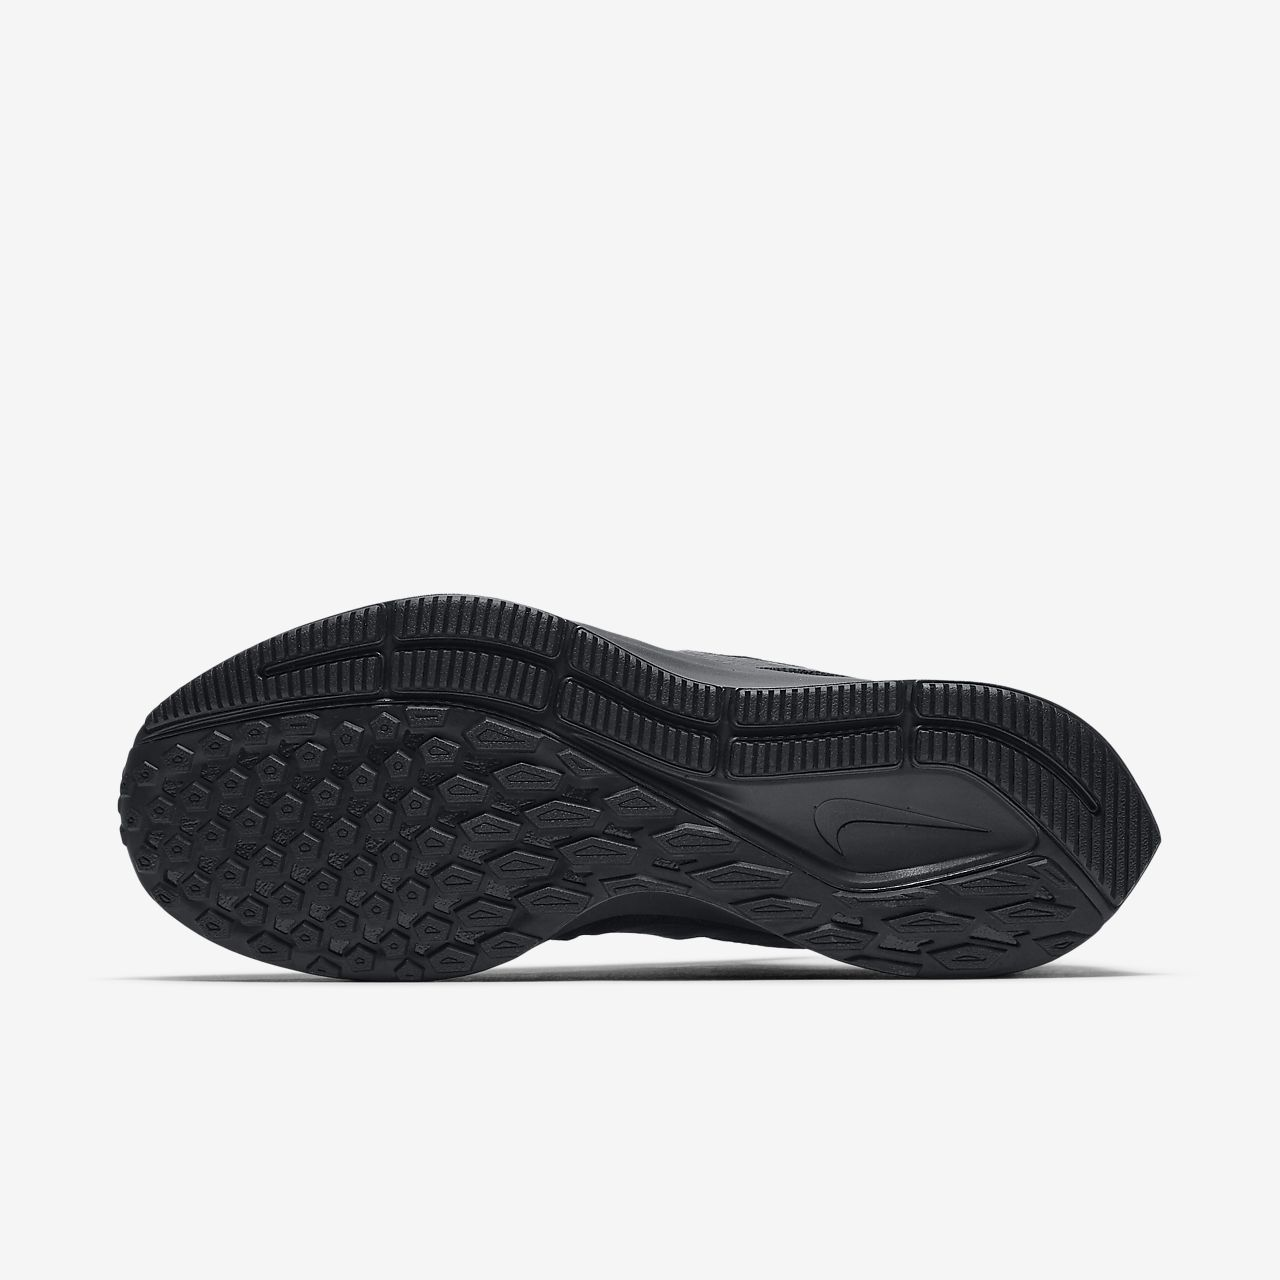 Nike Running Shoe Air Zoom Pegasus 34 BlackDark Grey Woman